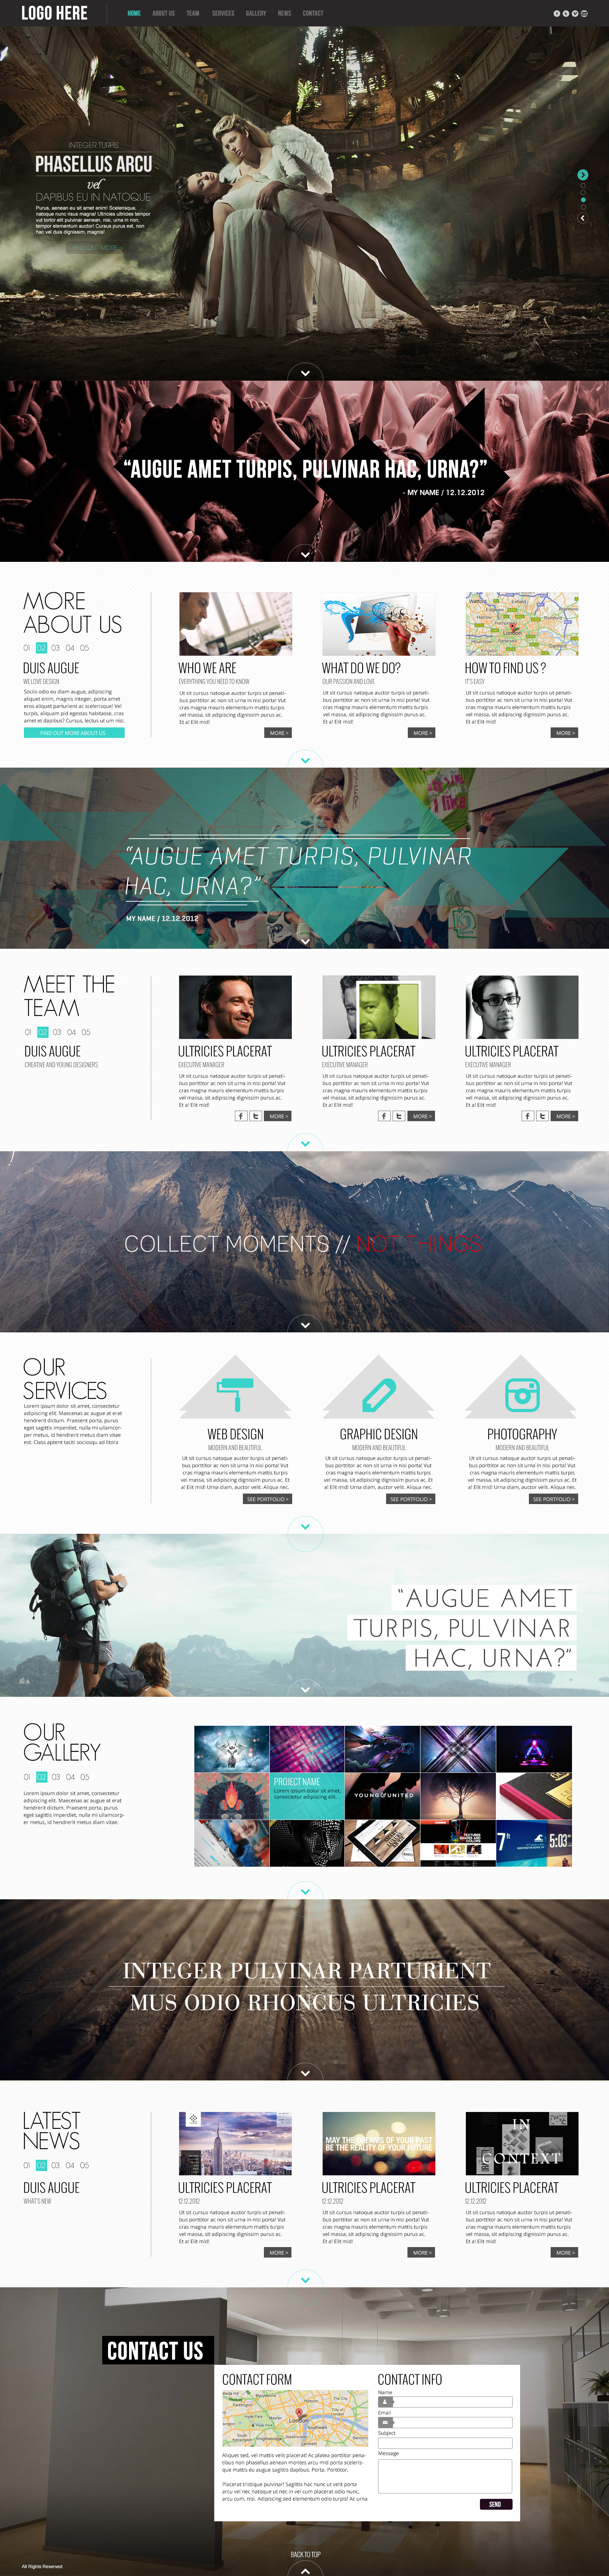 parallax design template